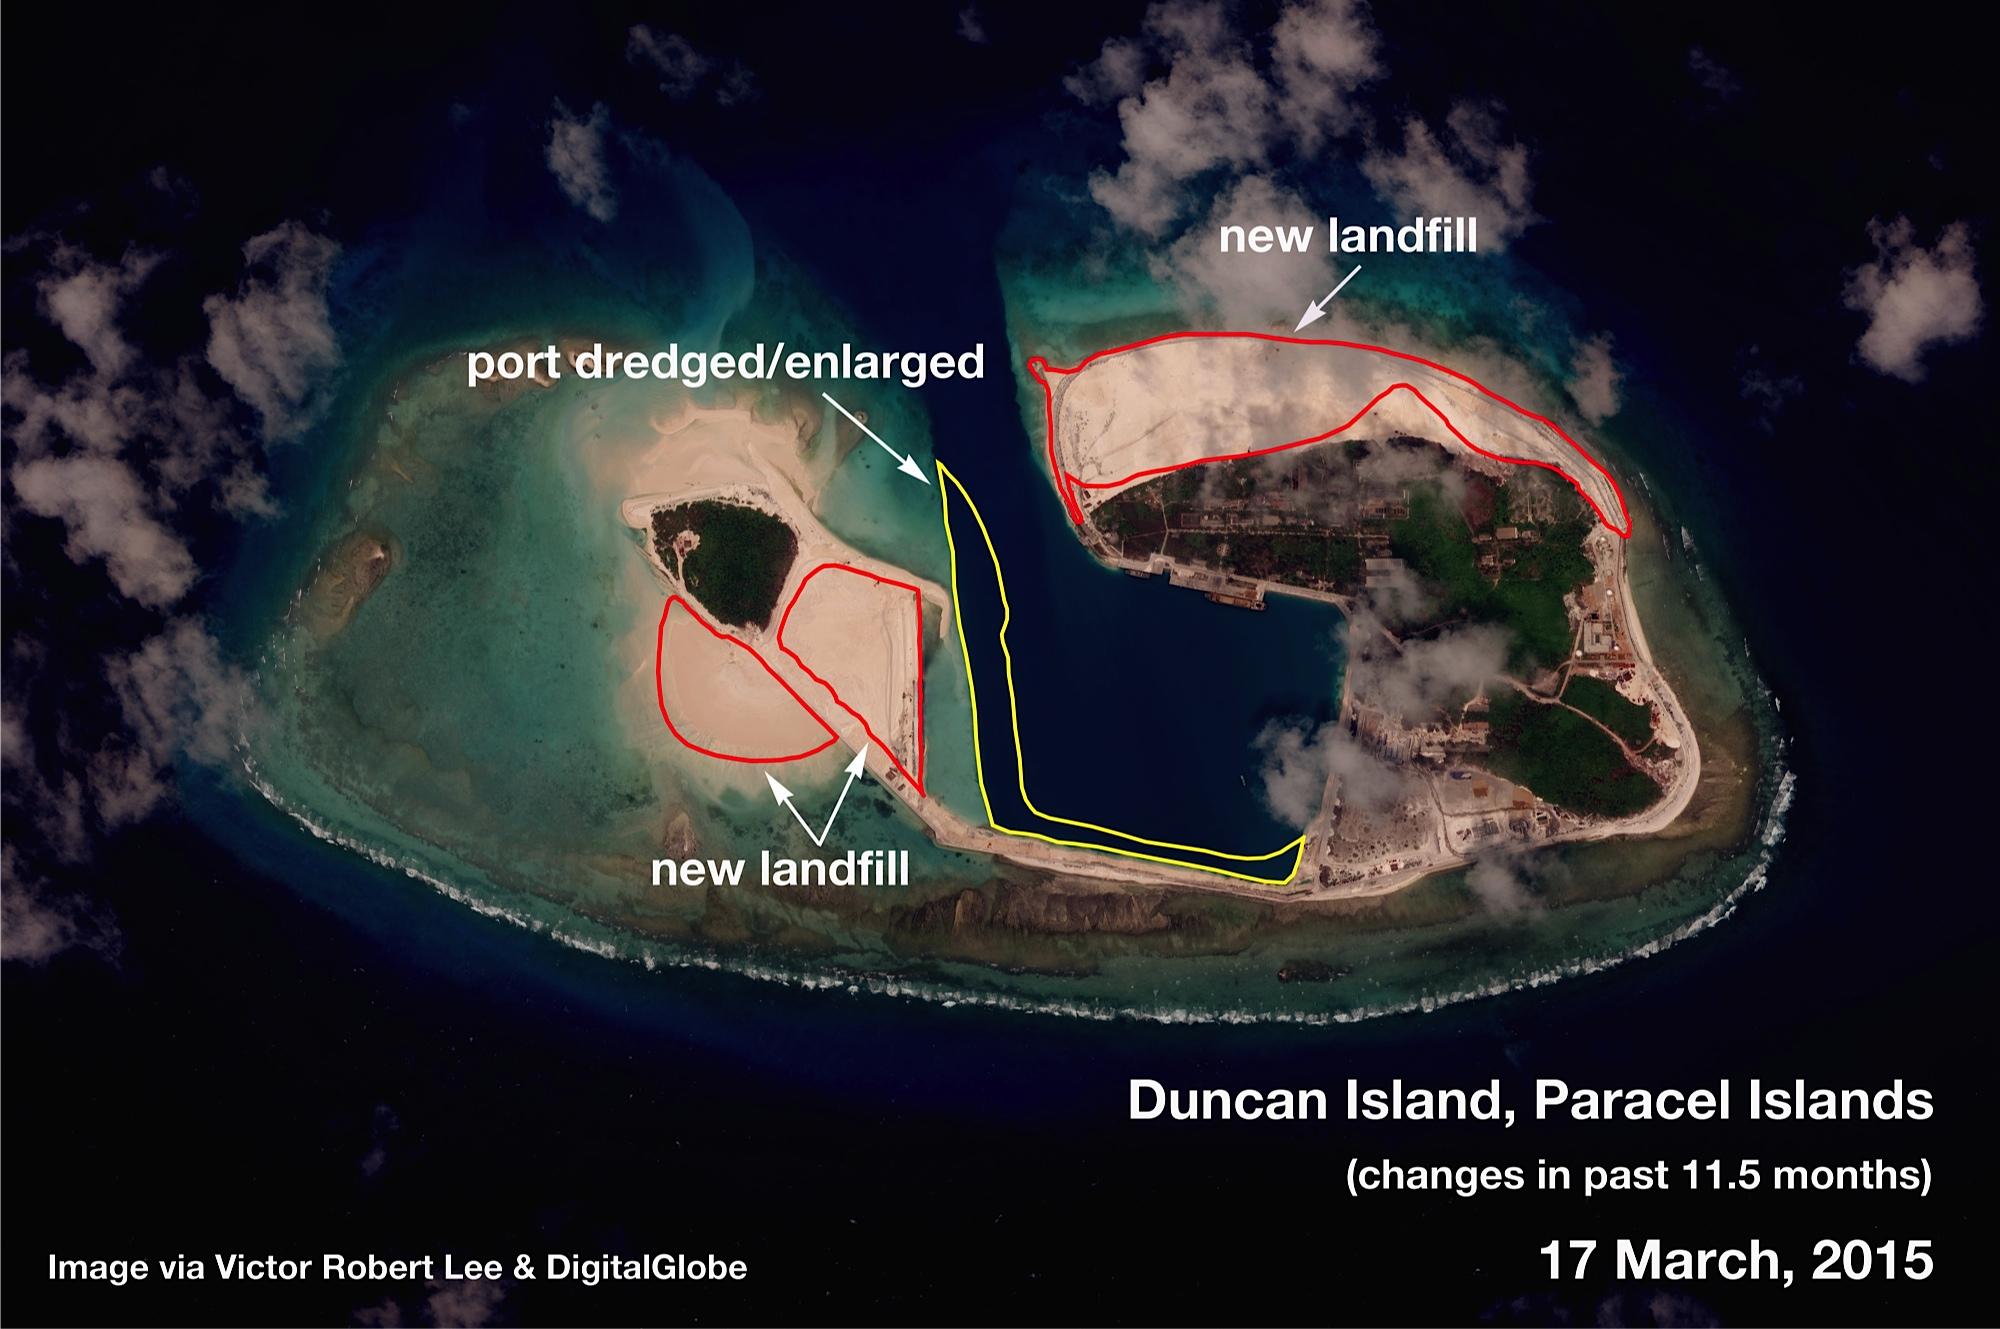 Duncan Island South China Sea